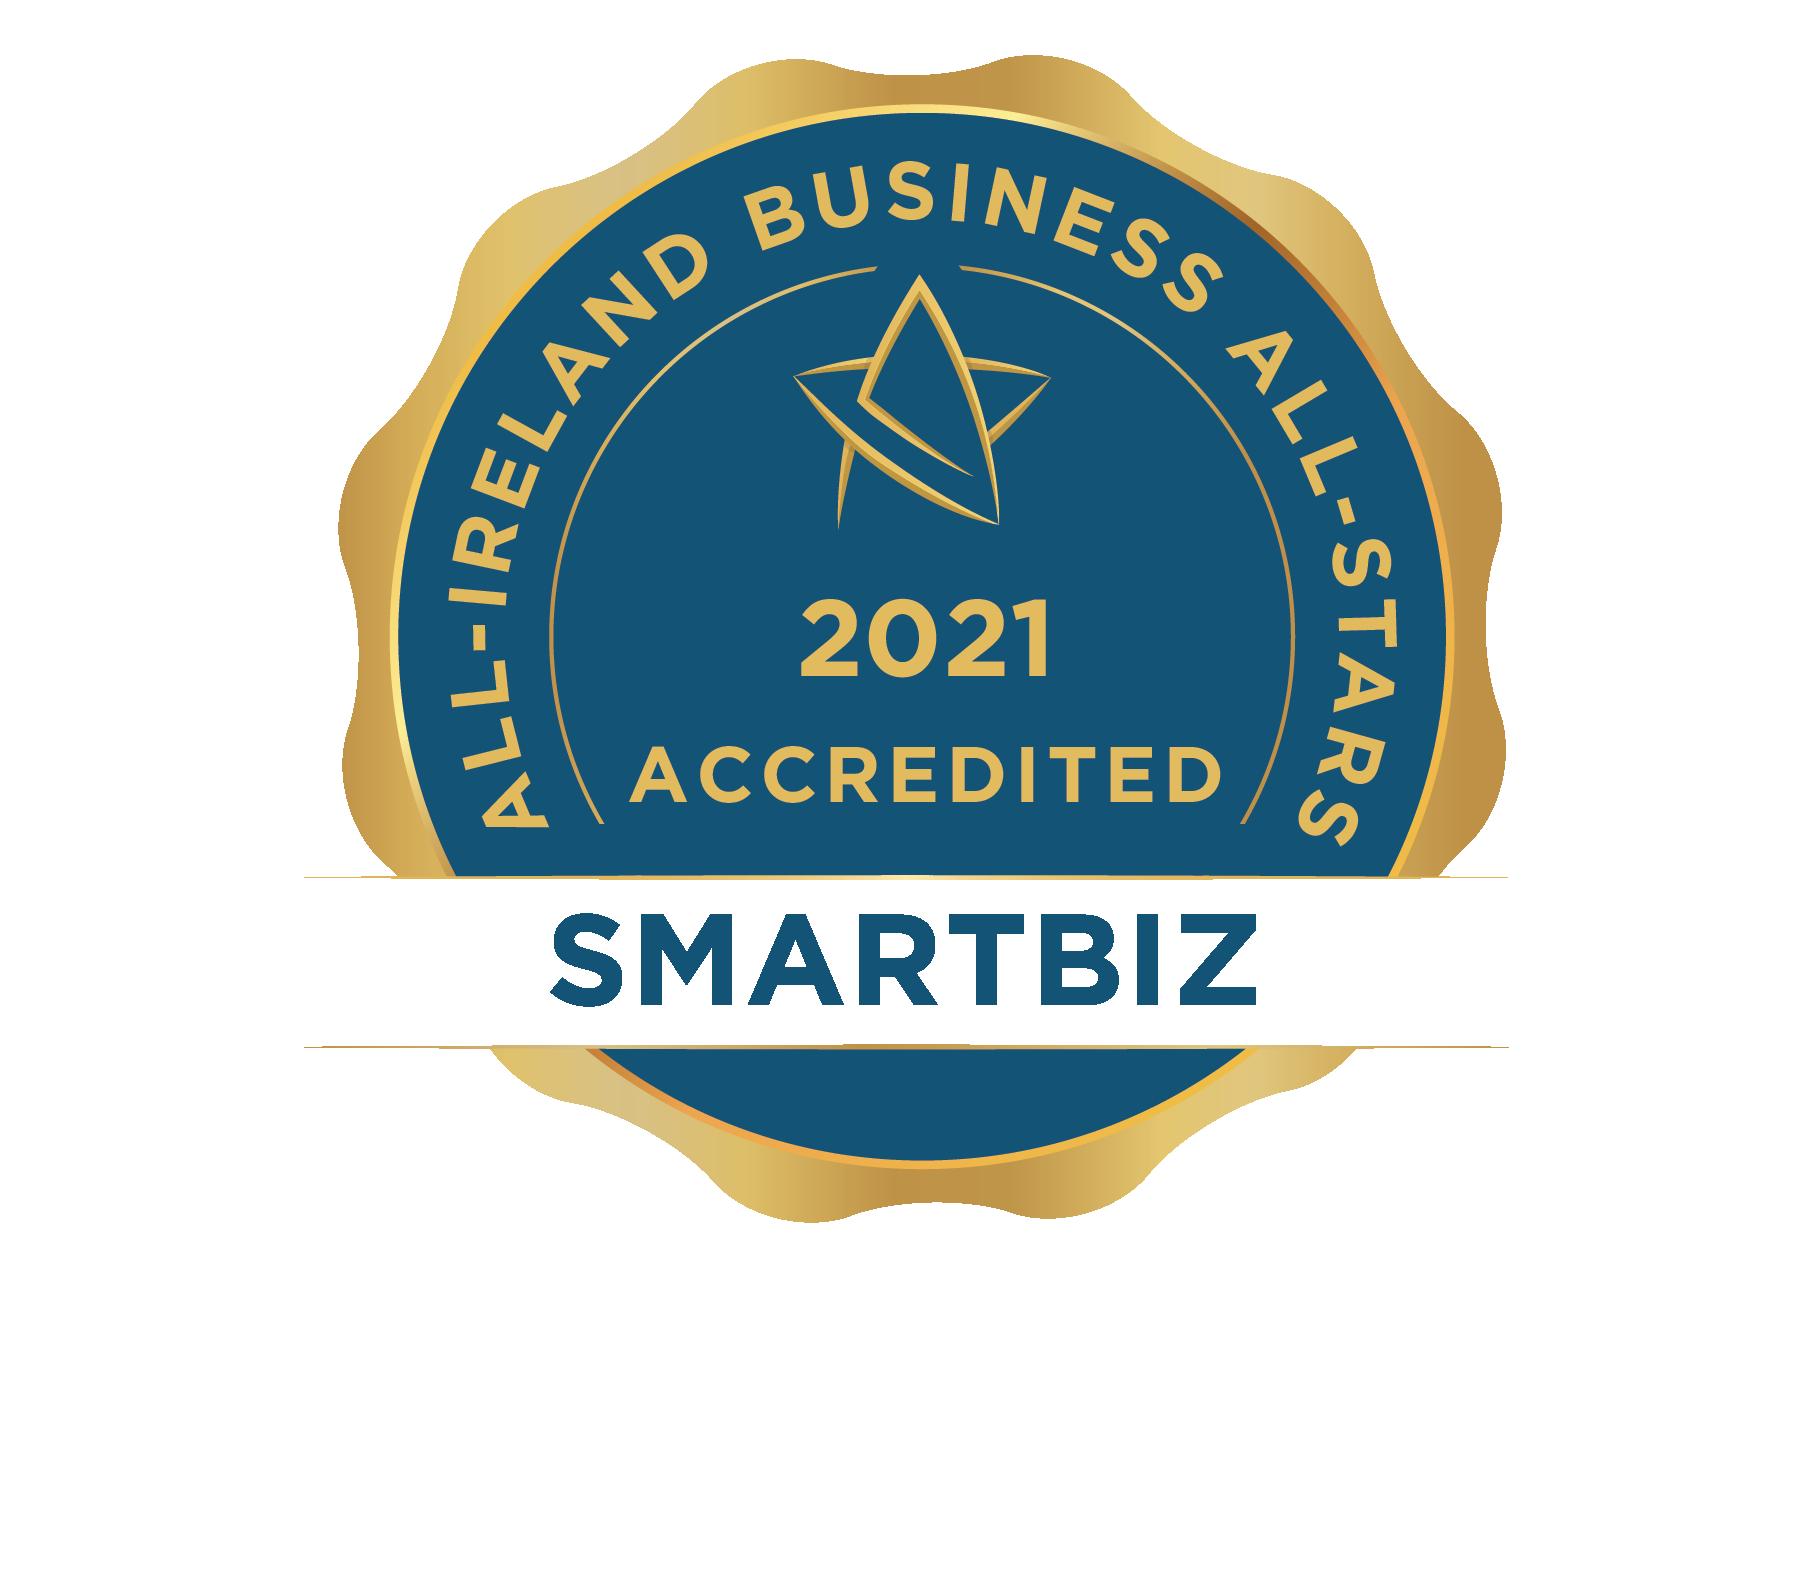 SmartBiz - Business All-Stars Accreditation